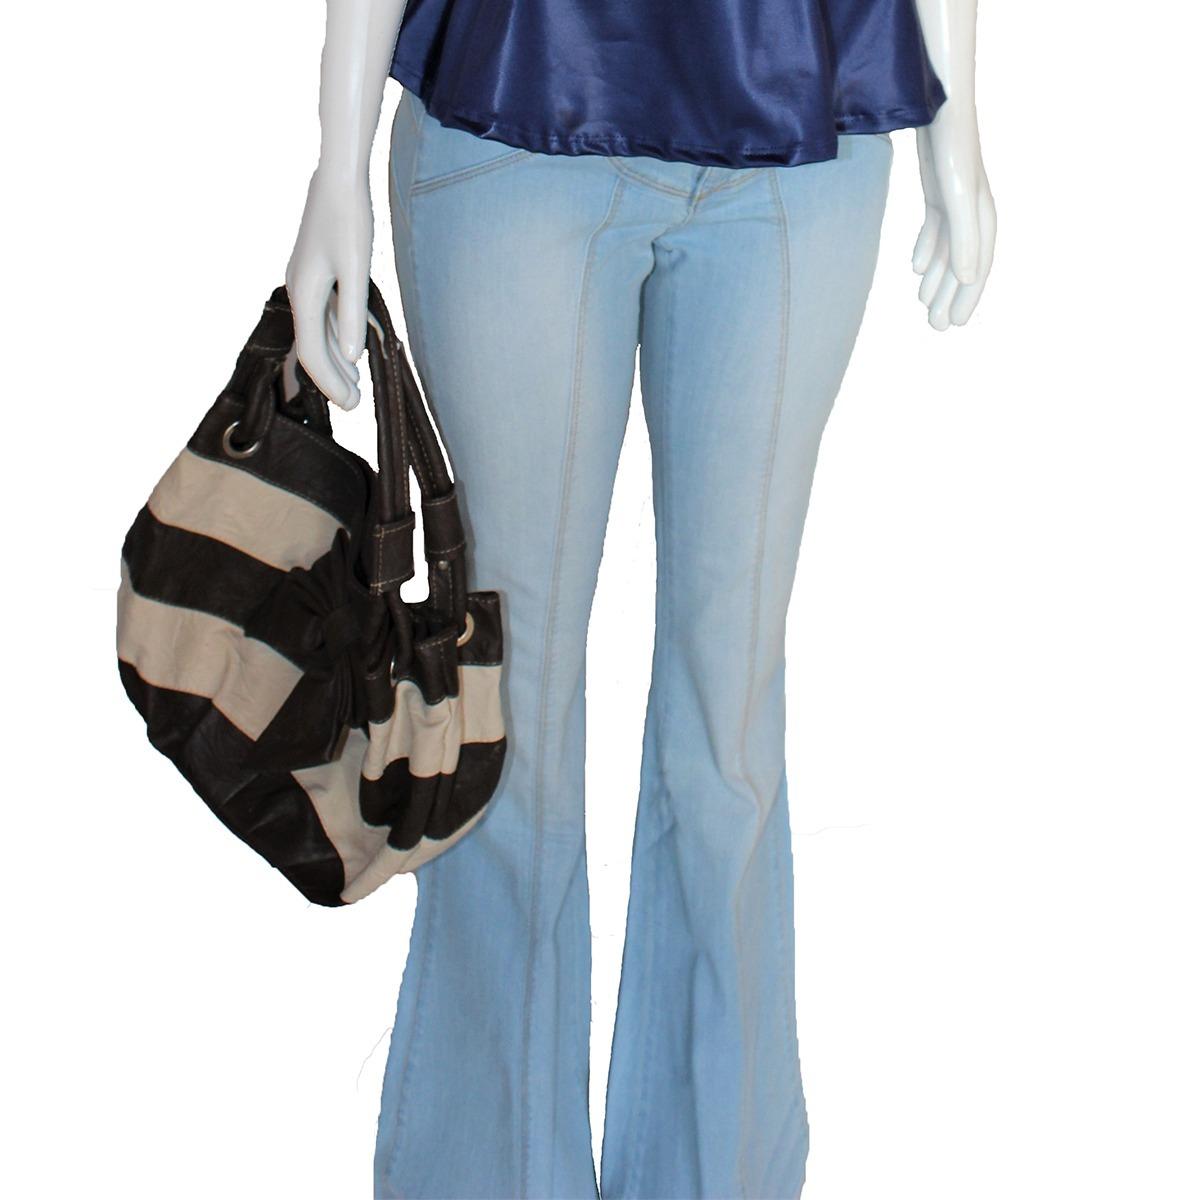 3b916f8ec calça jeans feminina flare boca de sino cintura alta linda. Carregando zoom.